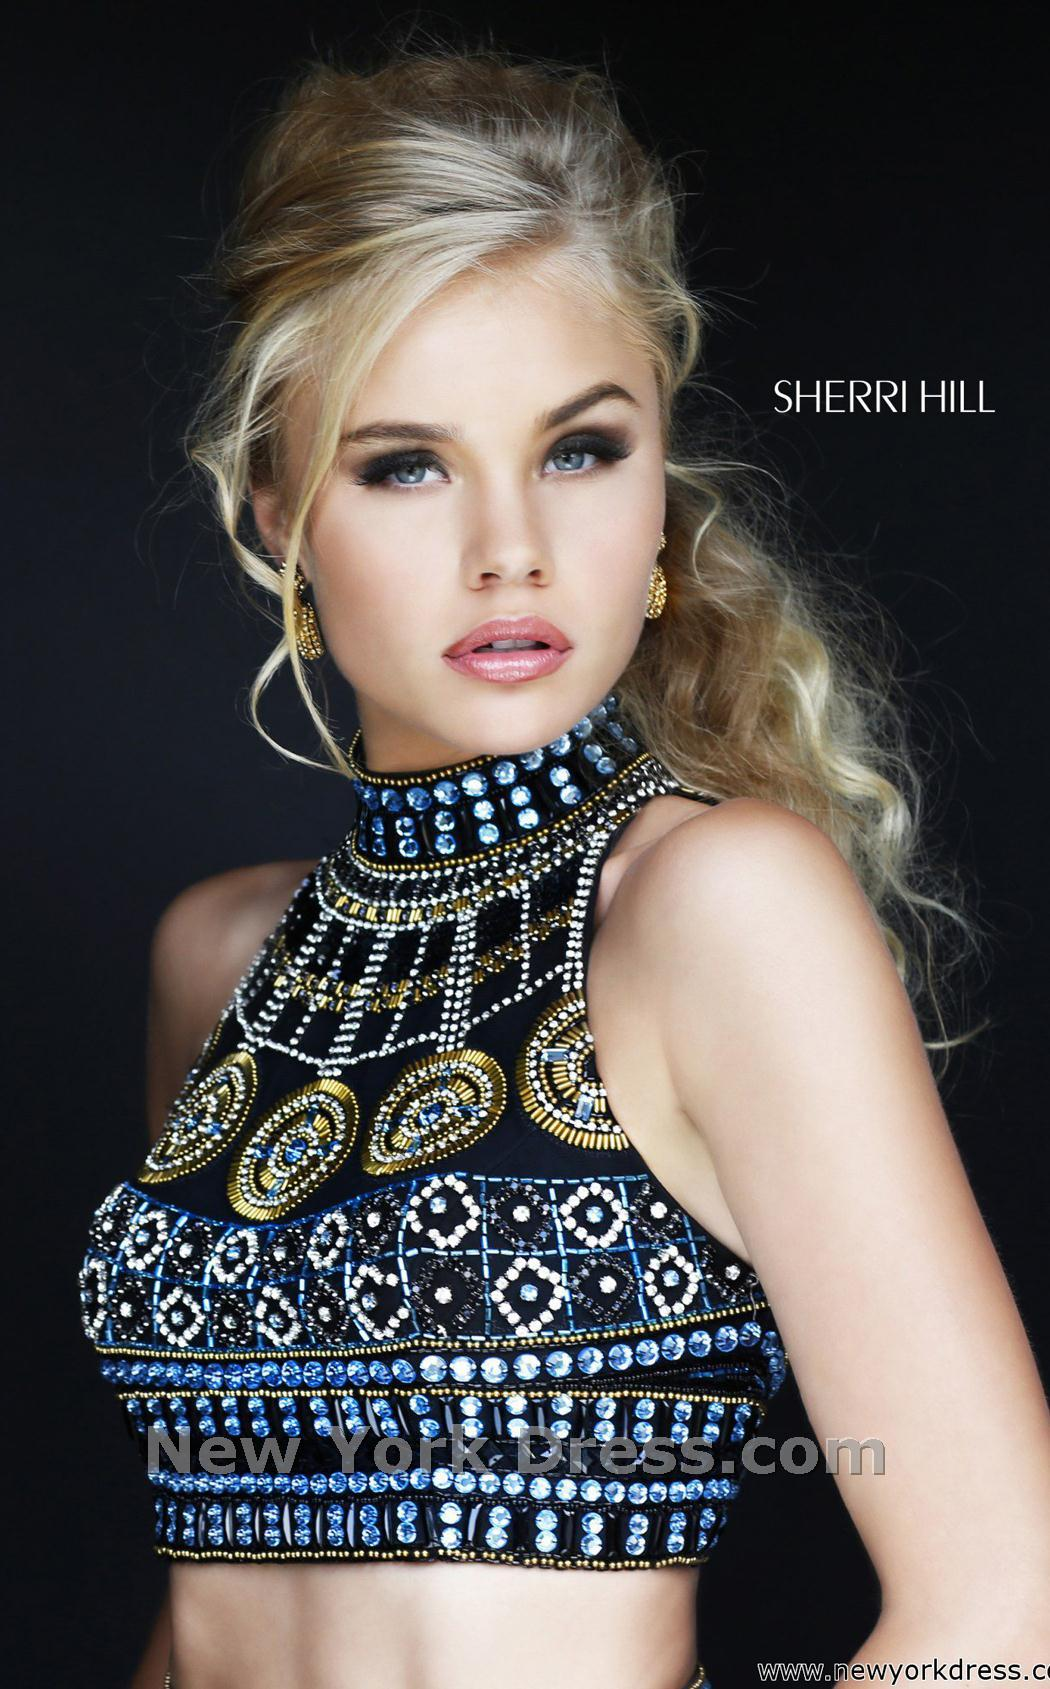 Sherri Hill 11068 Dress - NewYorkDress.com